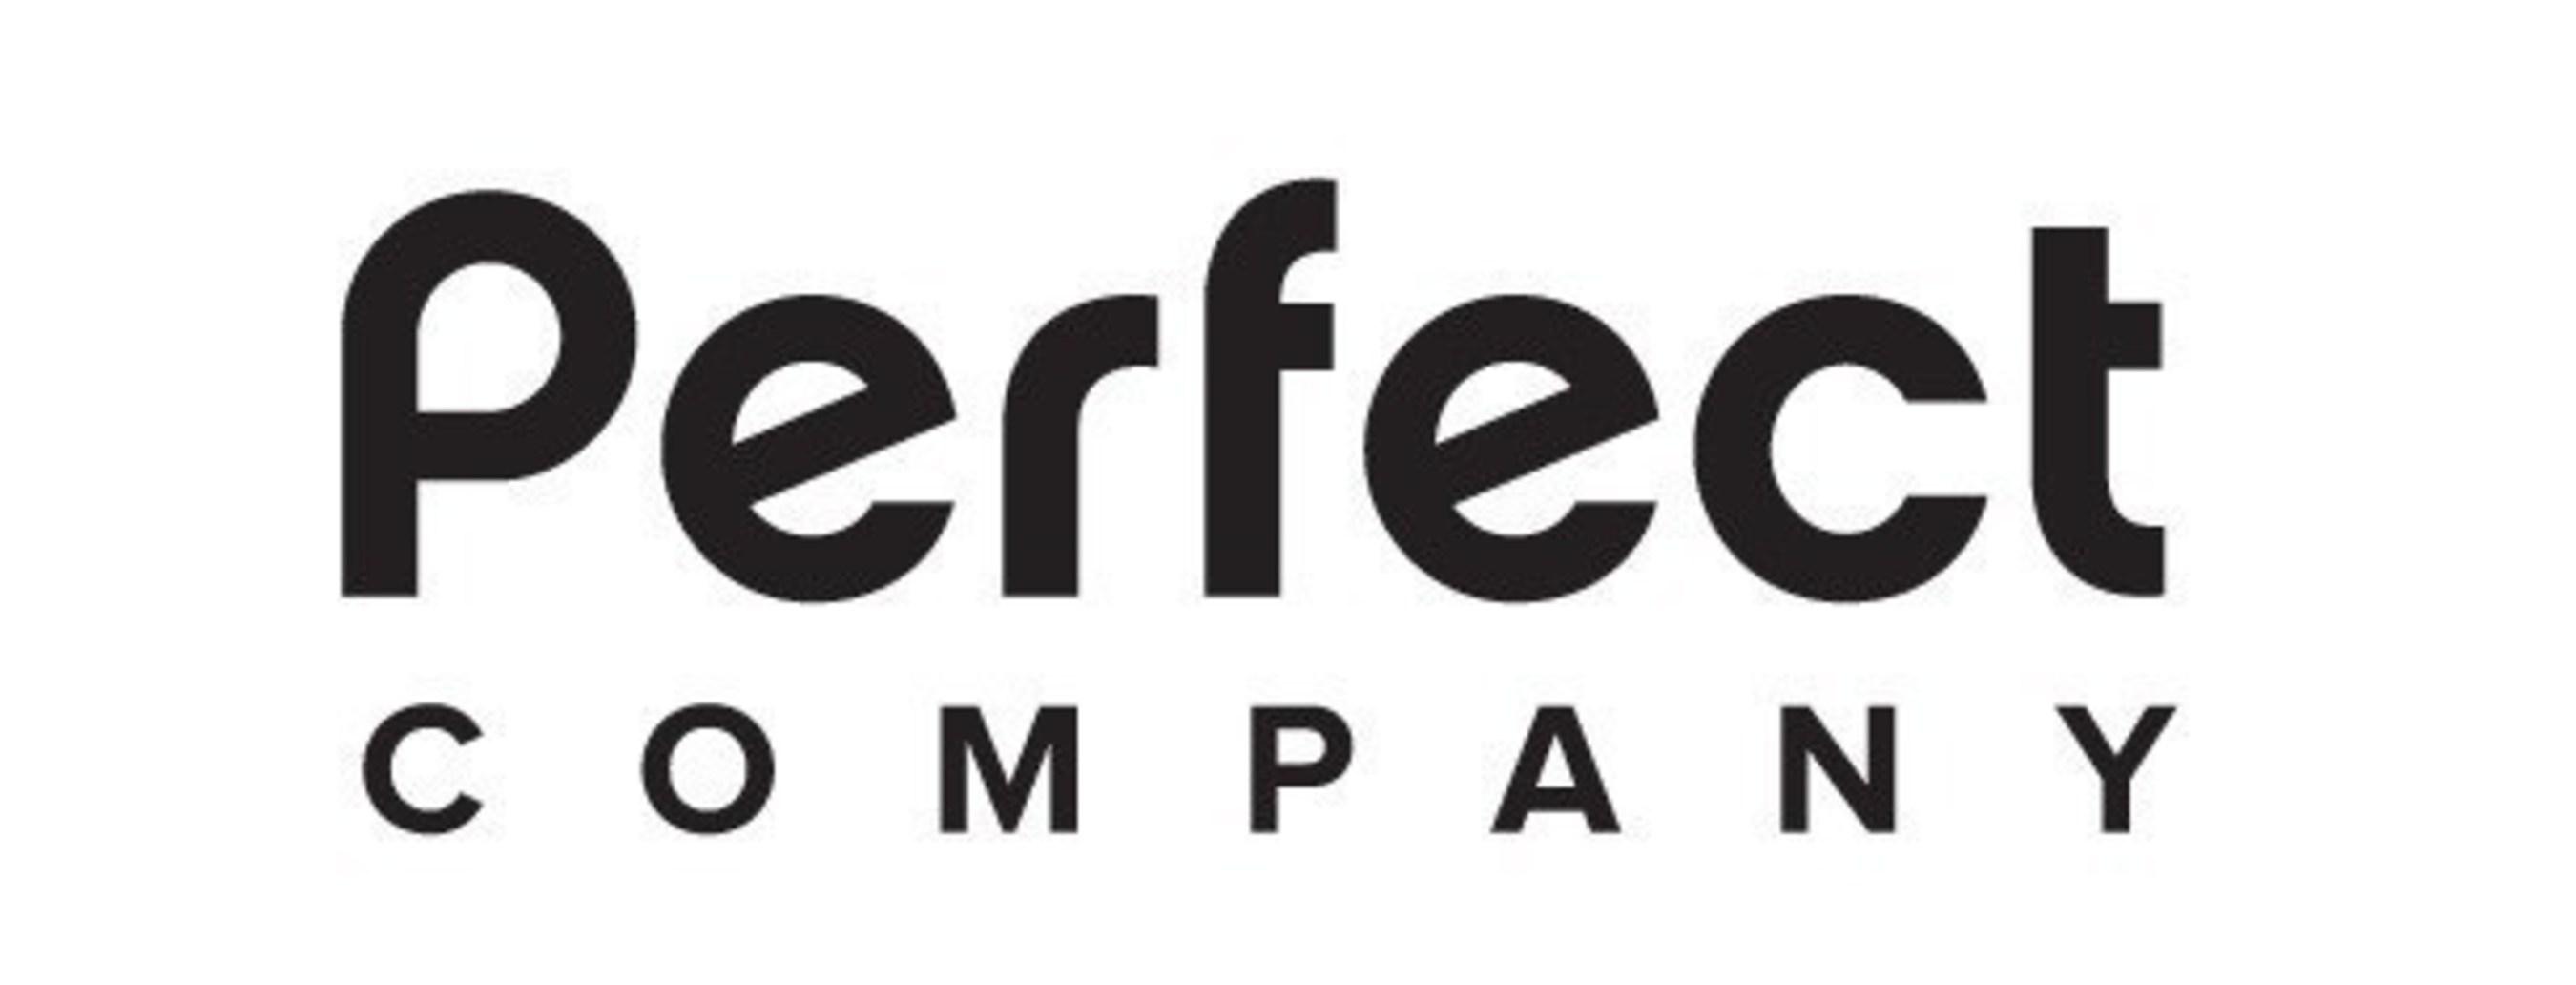 Perfect Company Logo